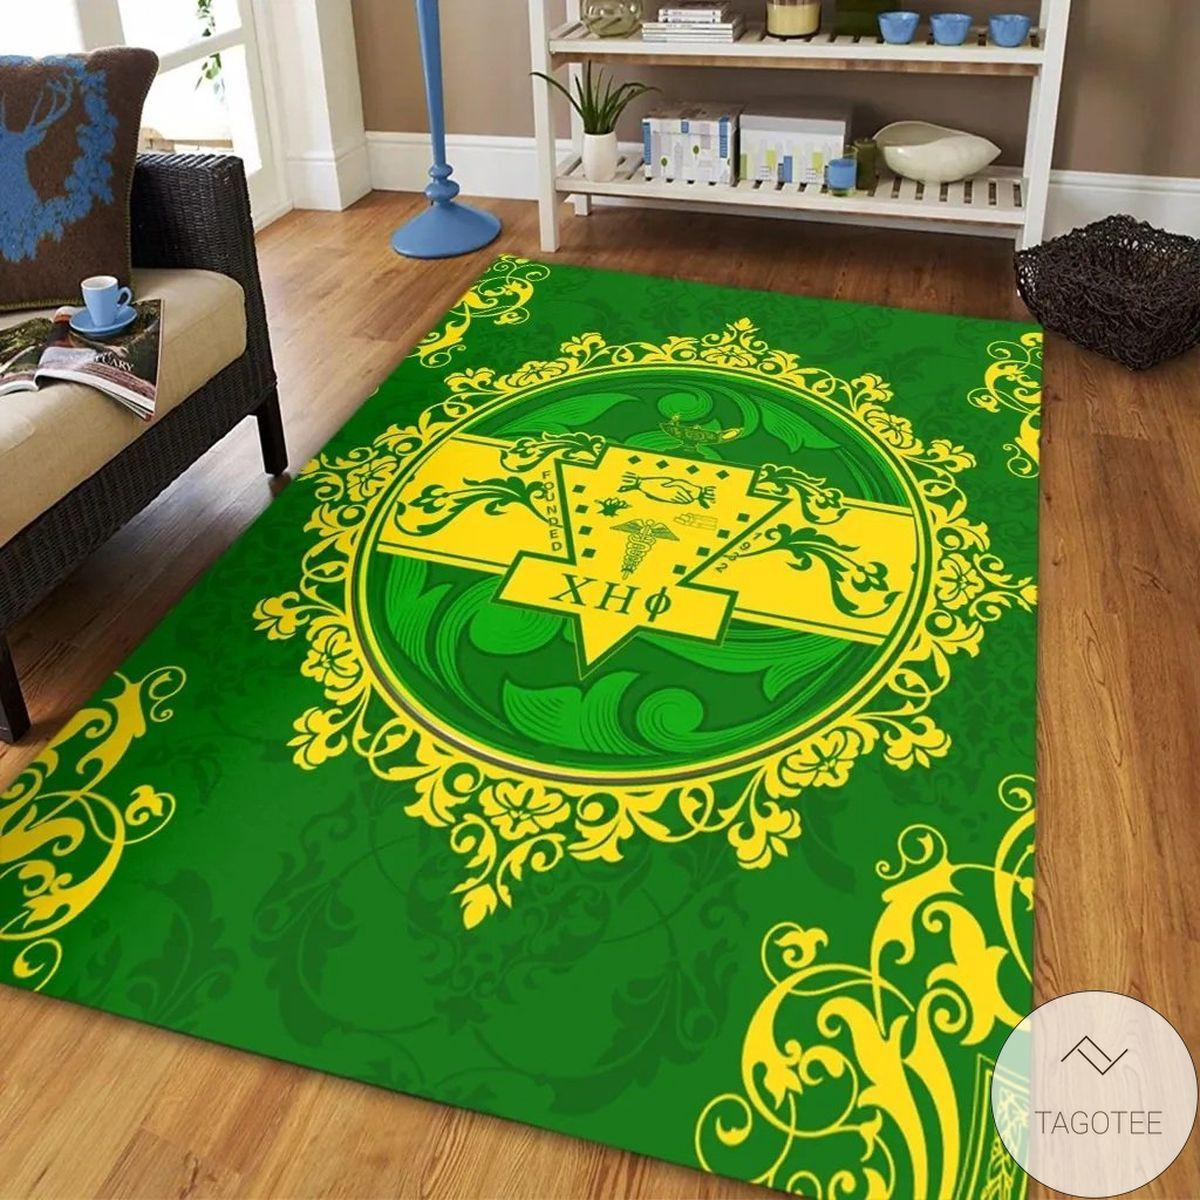 Chi Eta Phi 1932 Emblem Lemon Yellow Mandala Circle Green Background Rugz